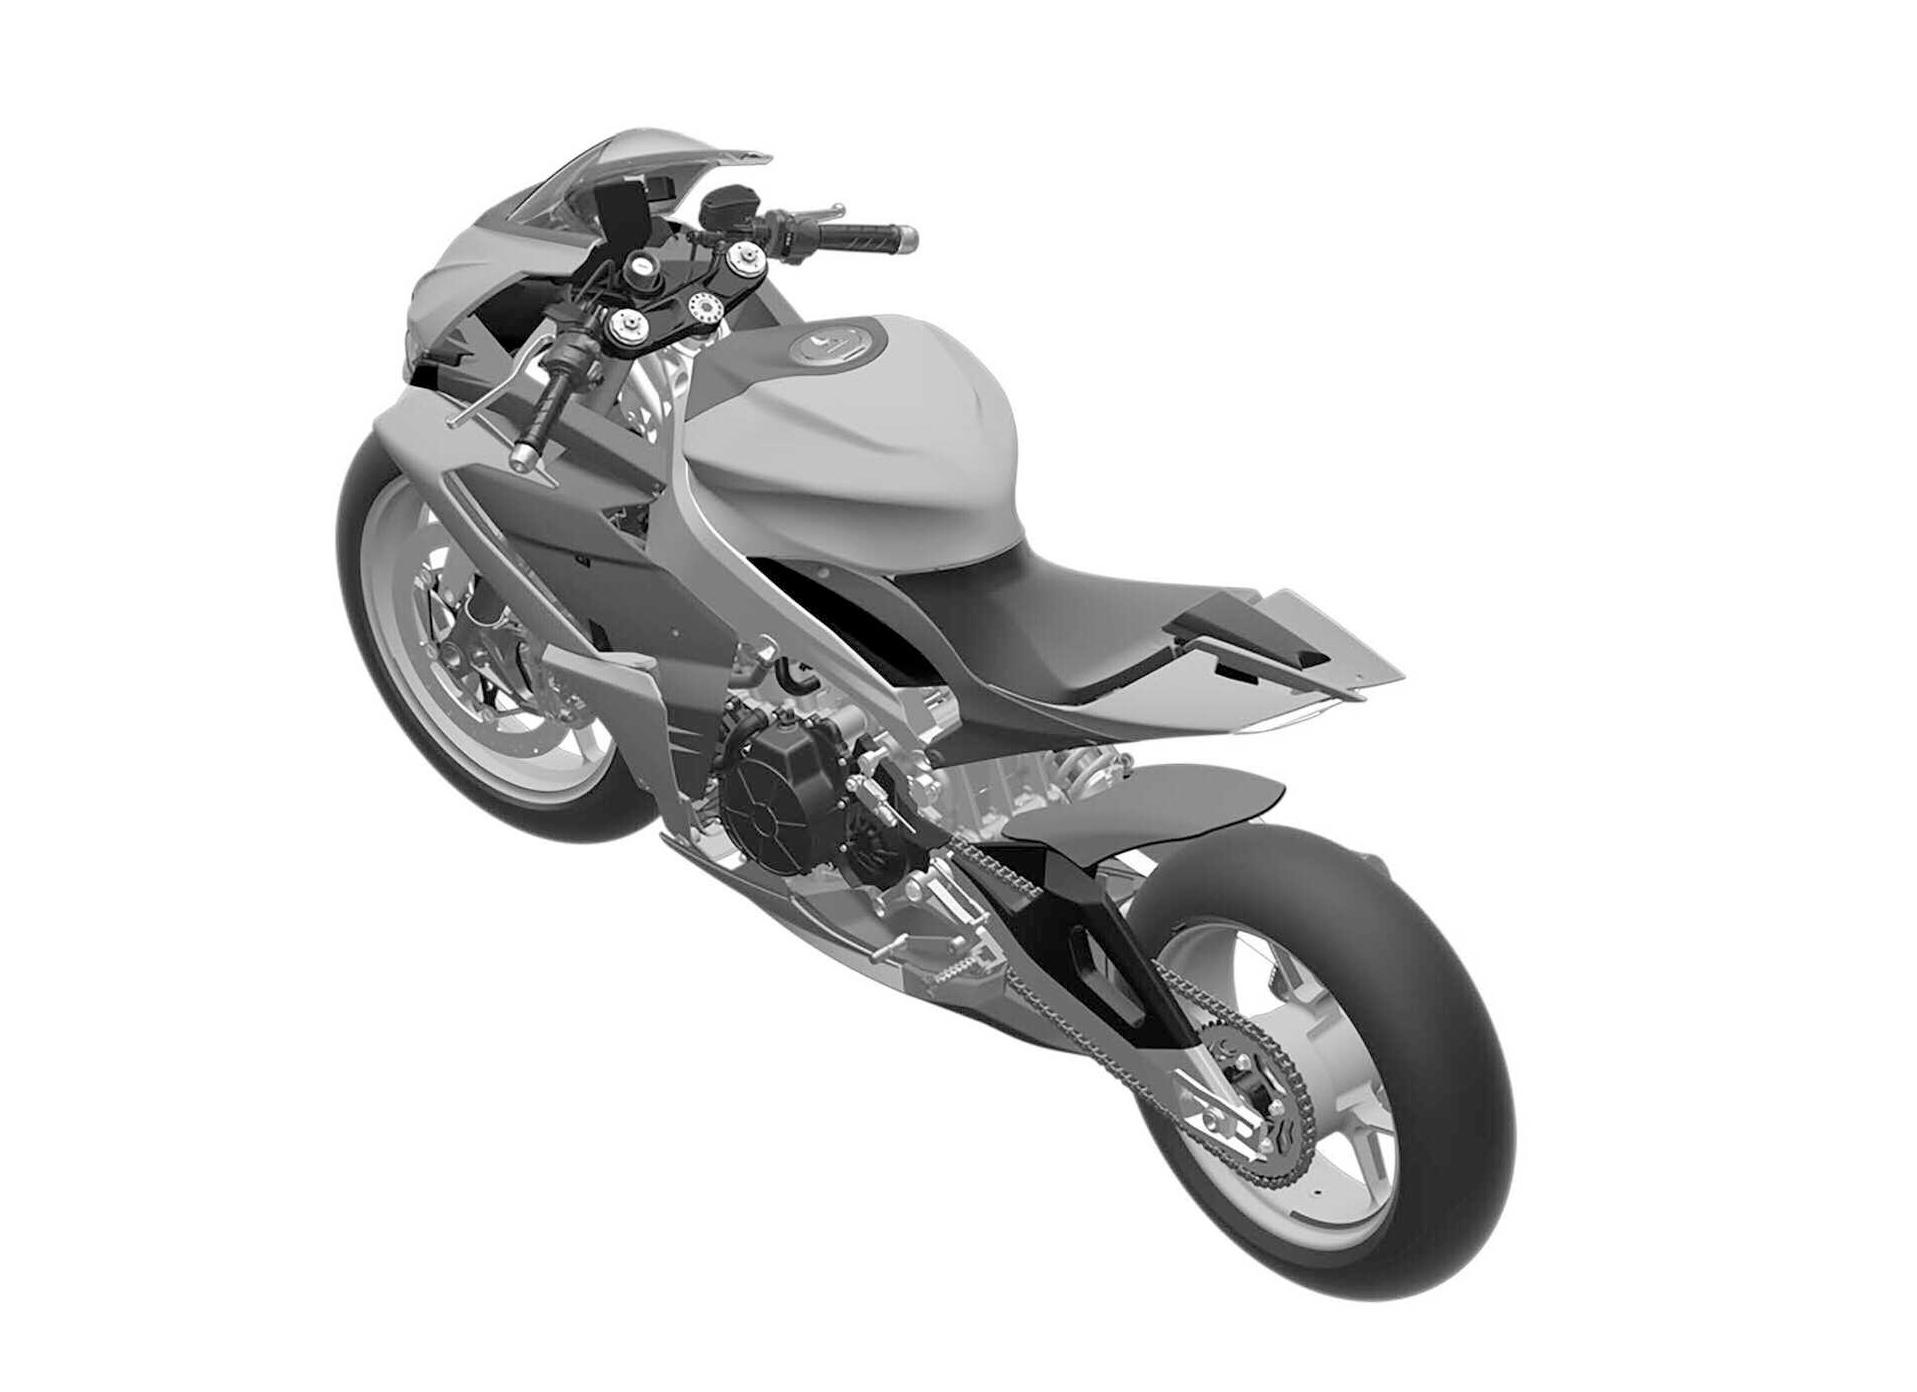 053019-2020-aprilia-rs660-concept-design-left-rear